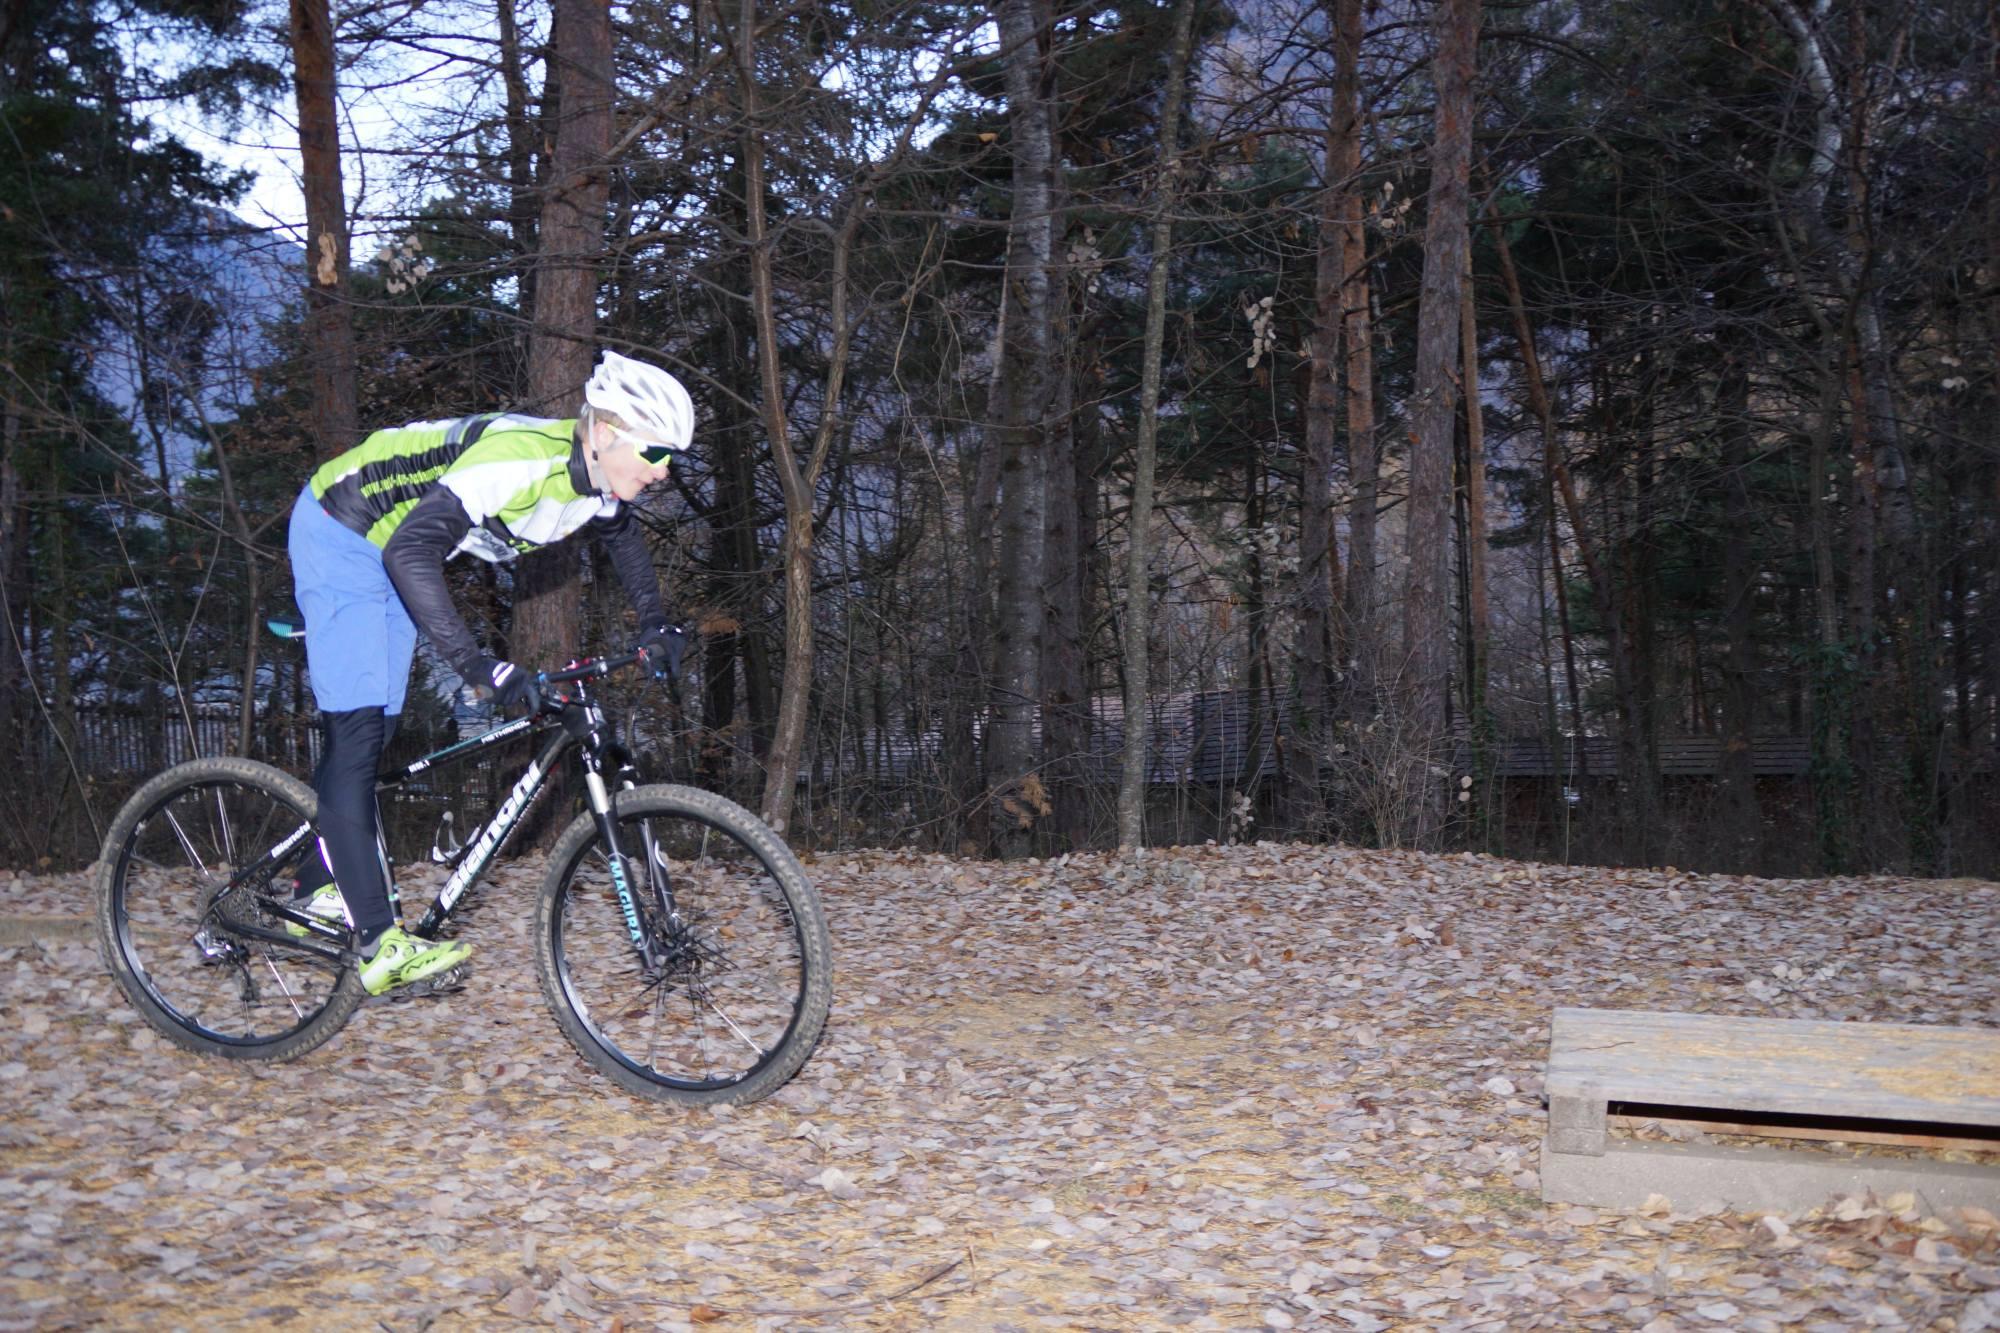 Bergsteigertipp MTB Hindernis 01 I (c) OetziBikeAcqademy